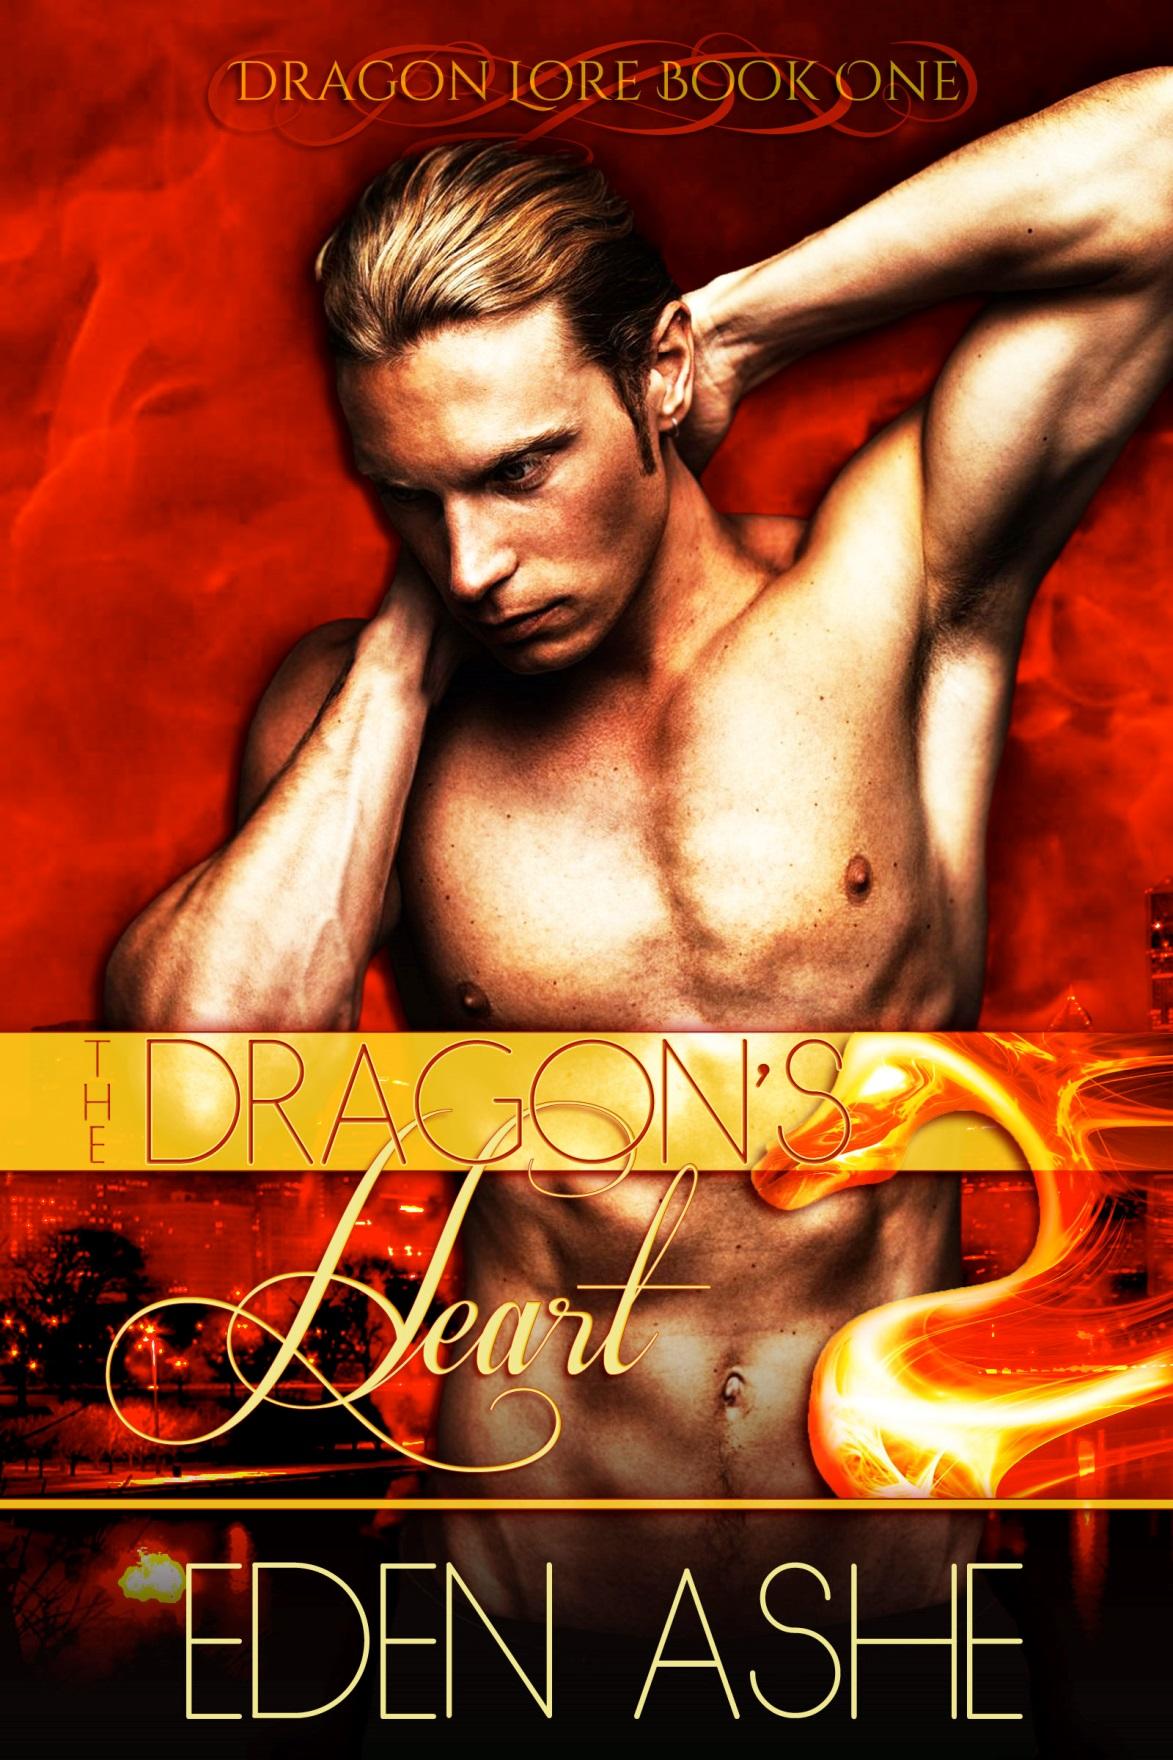 Dragon's Heart